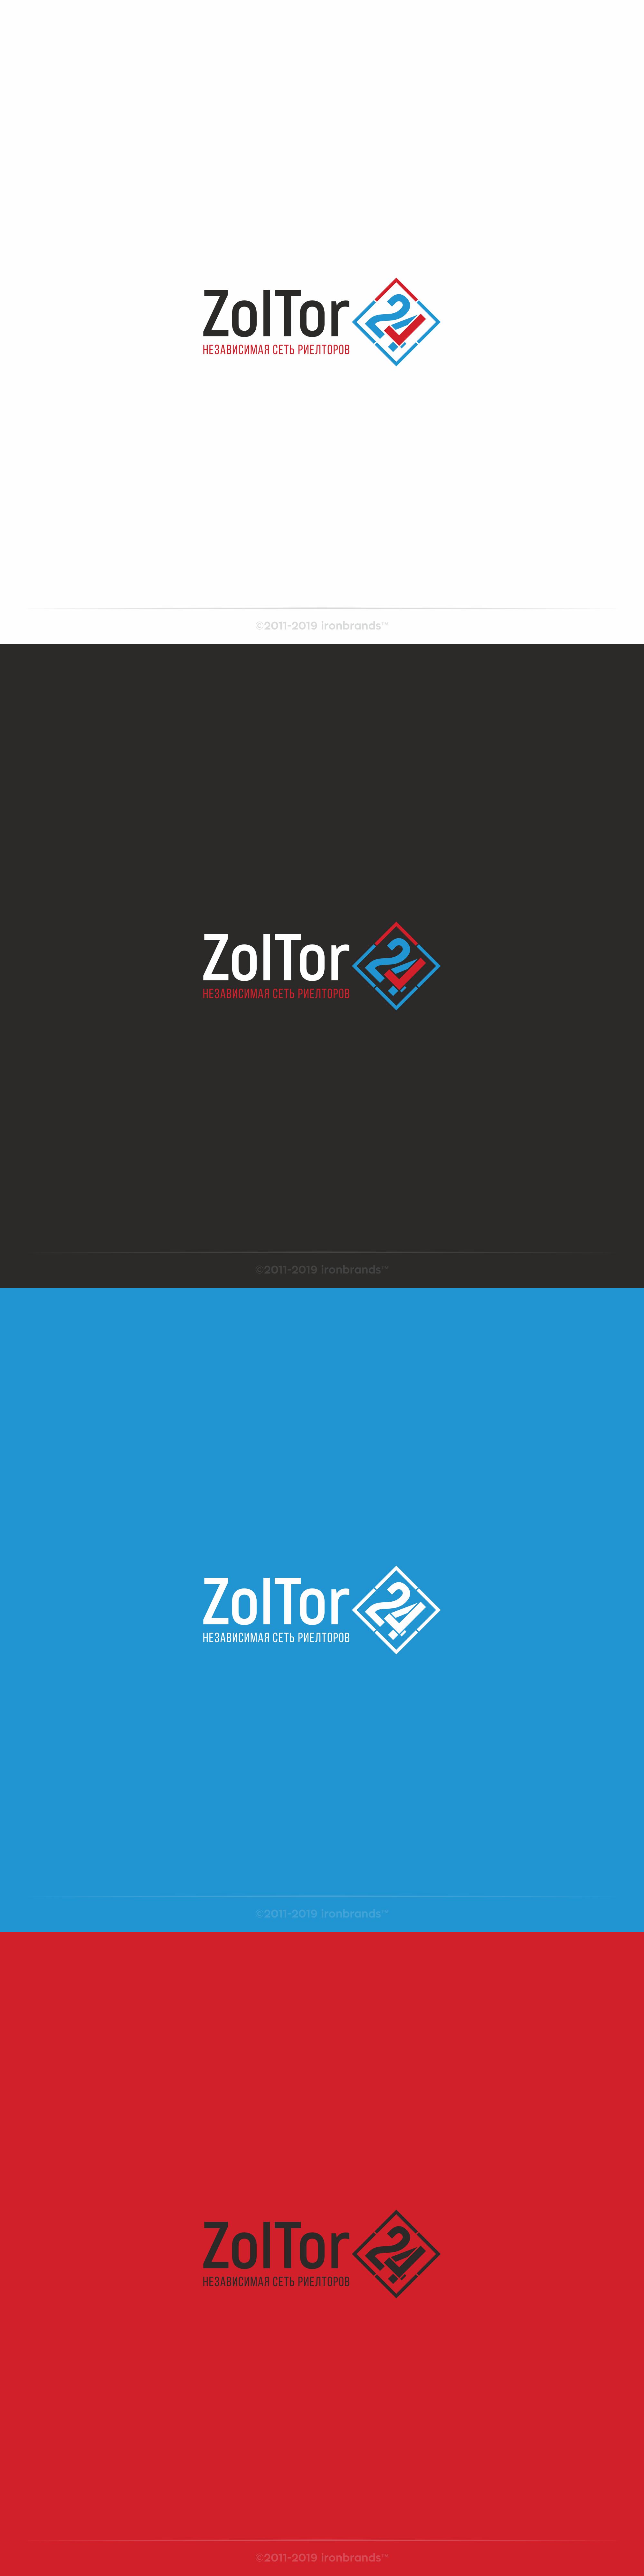 Логотип и фирменный стиль ZolTor24 фото f_0245c960bd21bb55.jpg